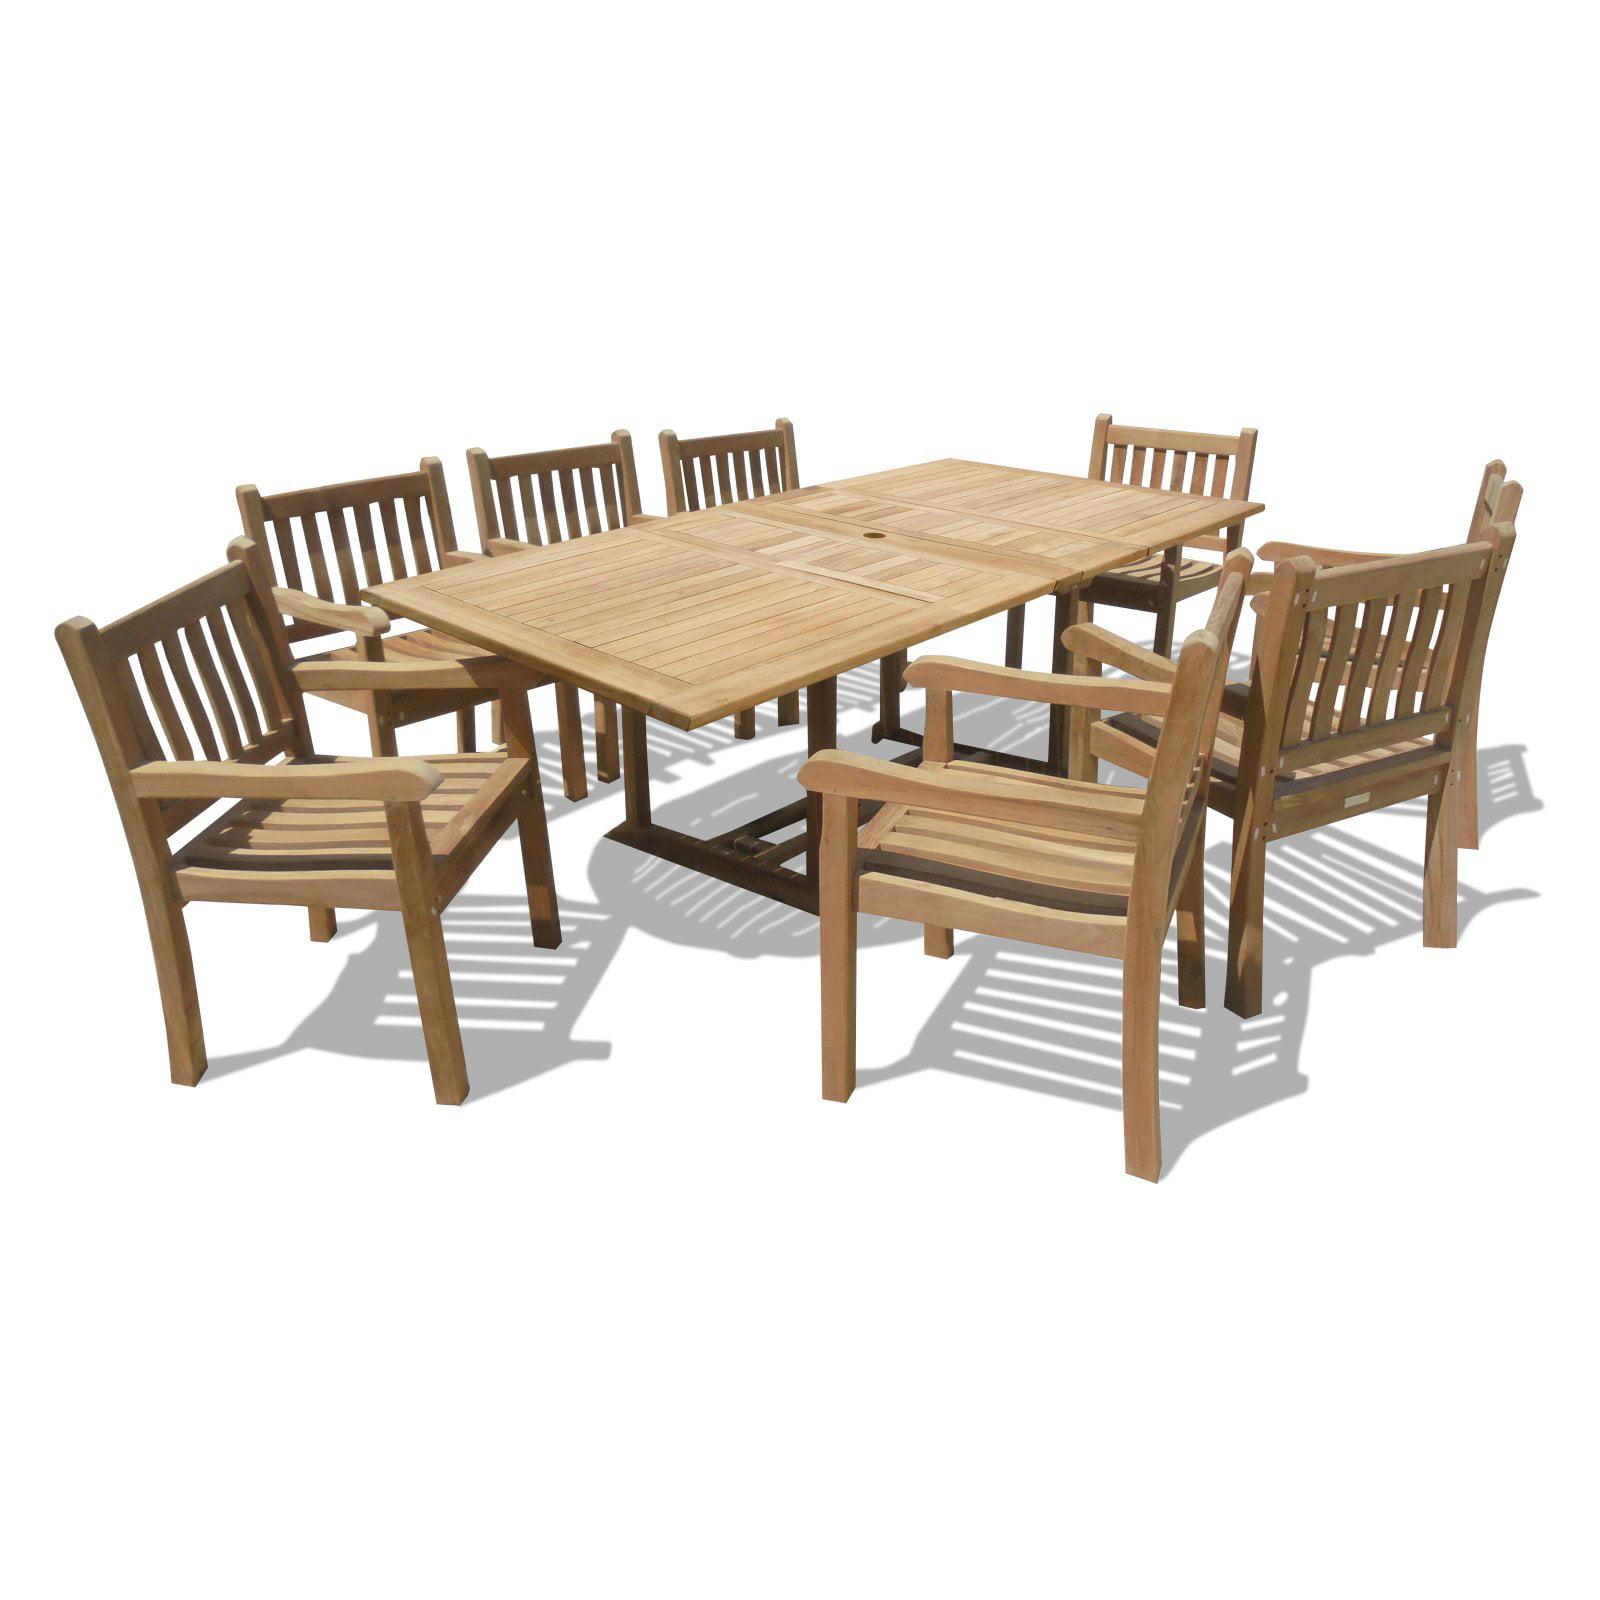 Windsor Teak Furniture Premium Teak 9 Piece Outdoor Dining Room Set by Windsor Teak Furniture